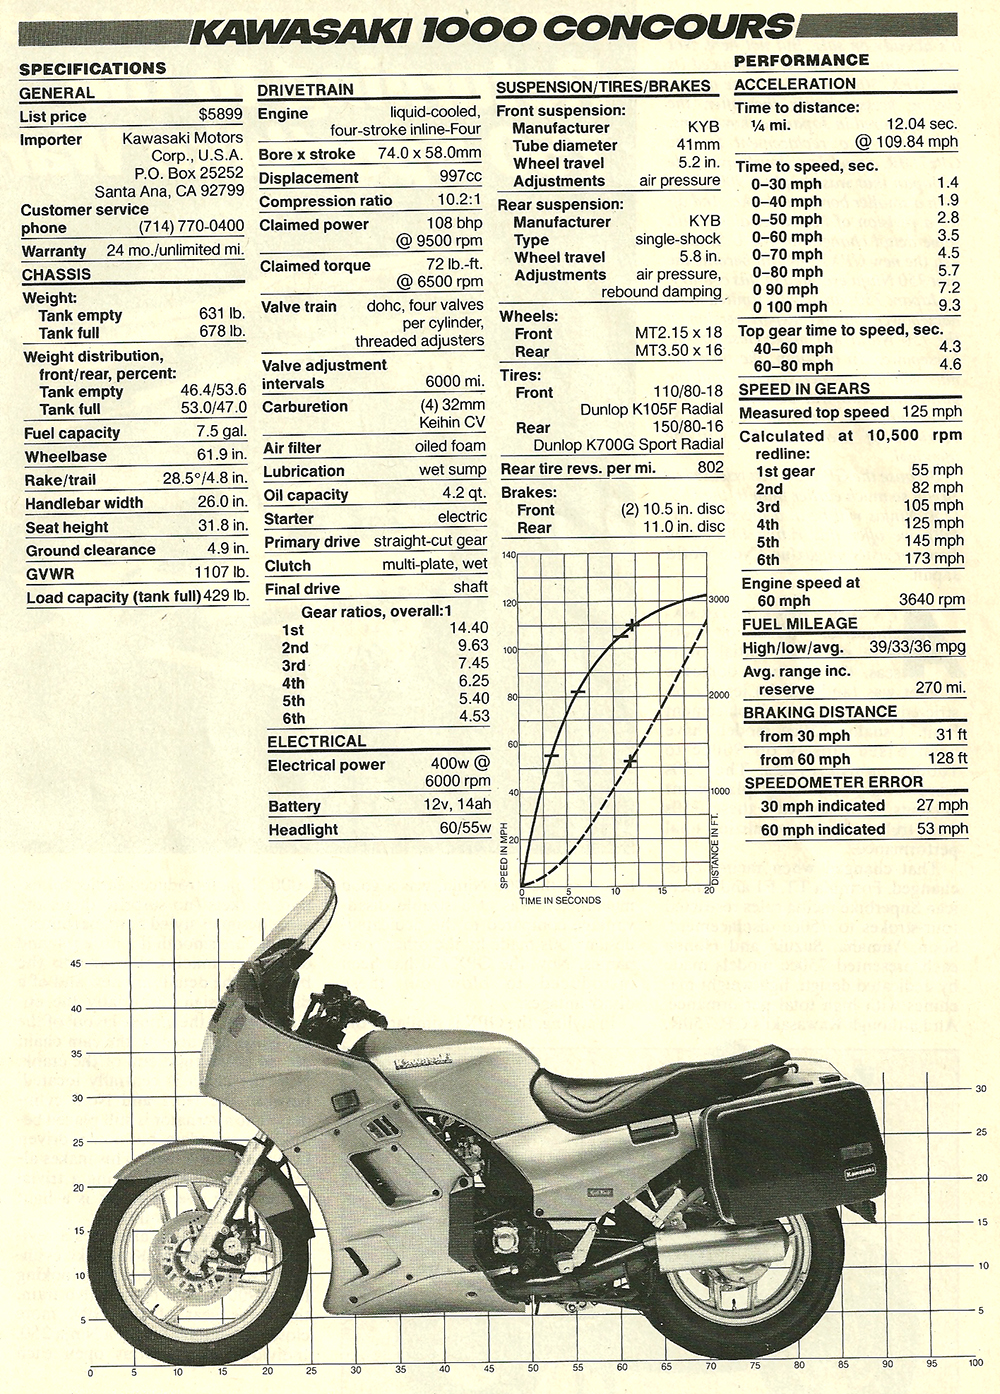 1986 Kawasaki 1000 Concours road test 06.jpg